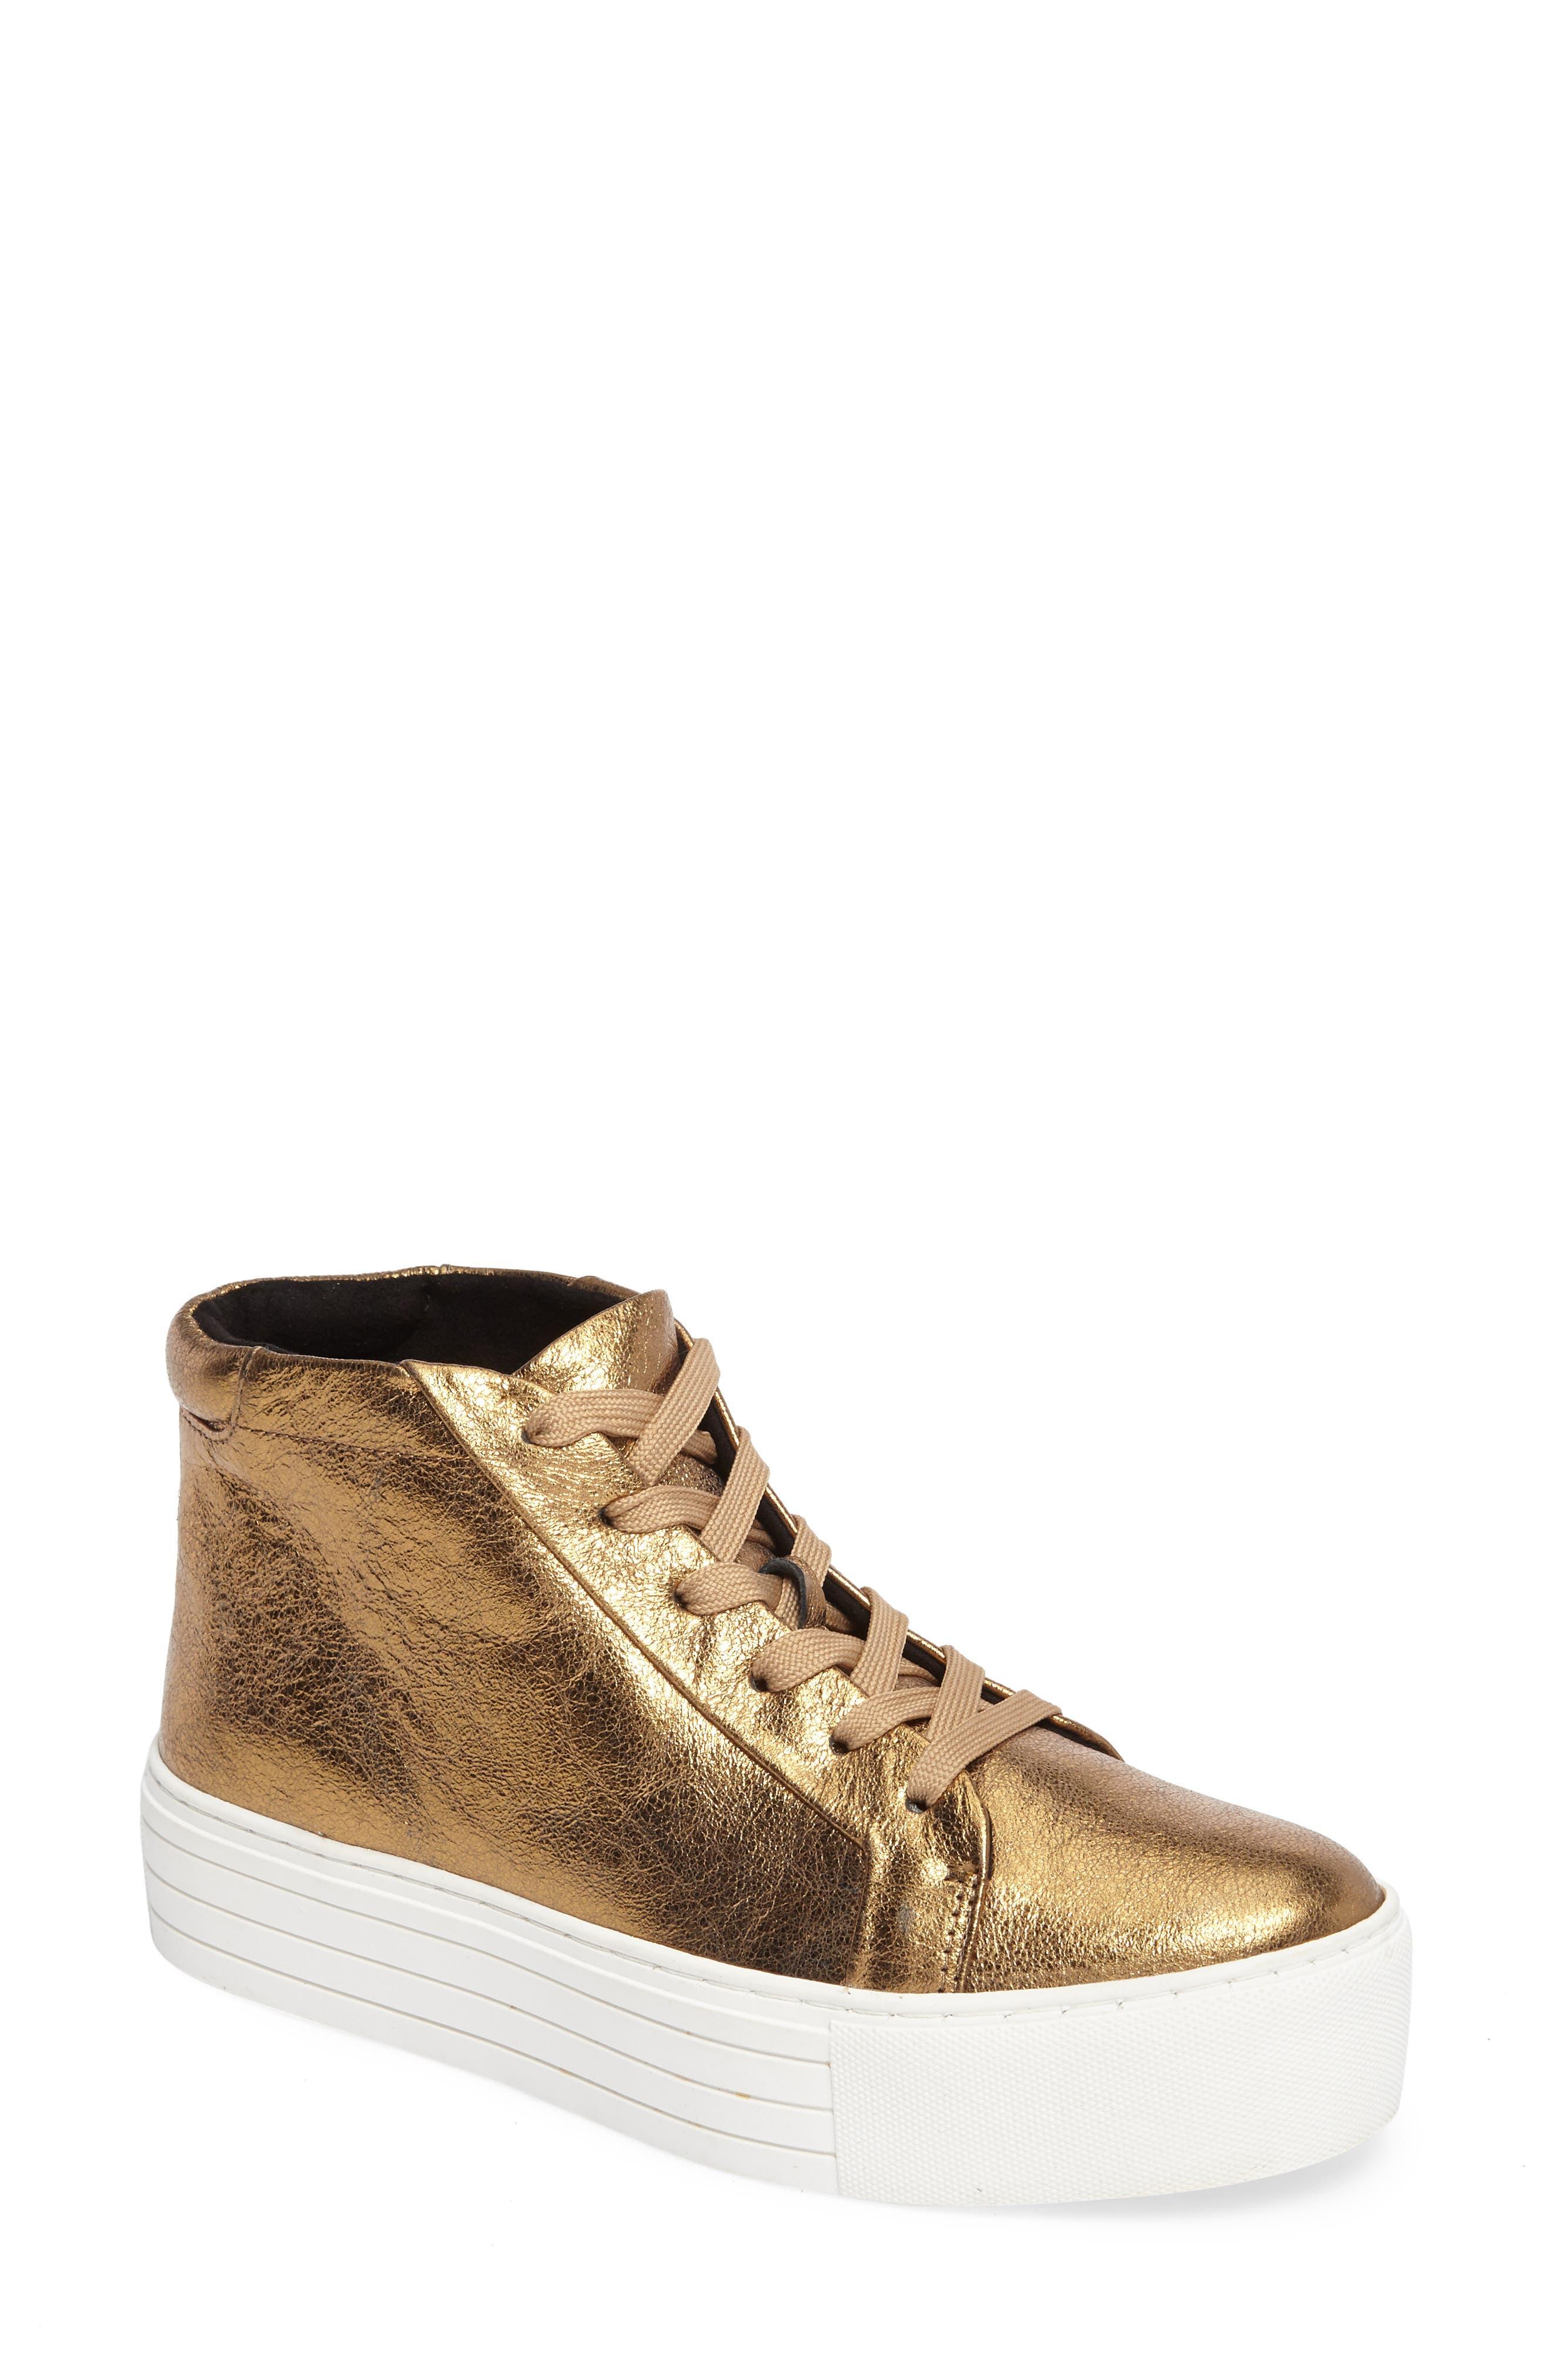 Alternate Image 1 Selected - Kenneth Cole New York Janette High Top Platform Sneaker (Women)